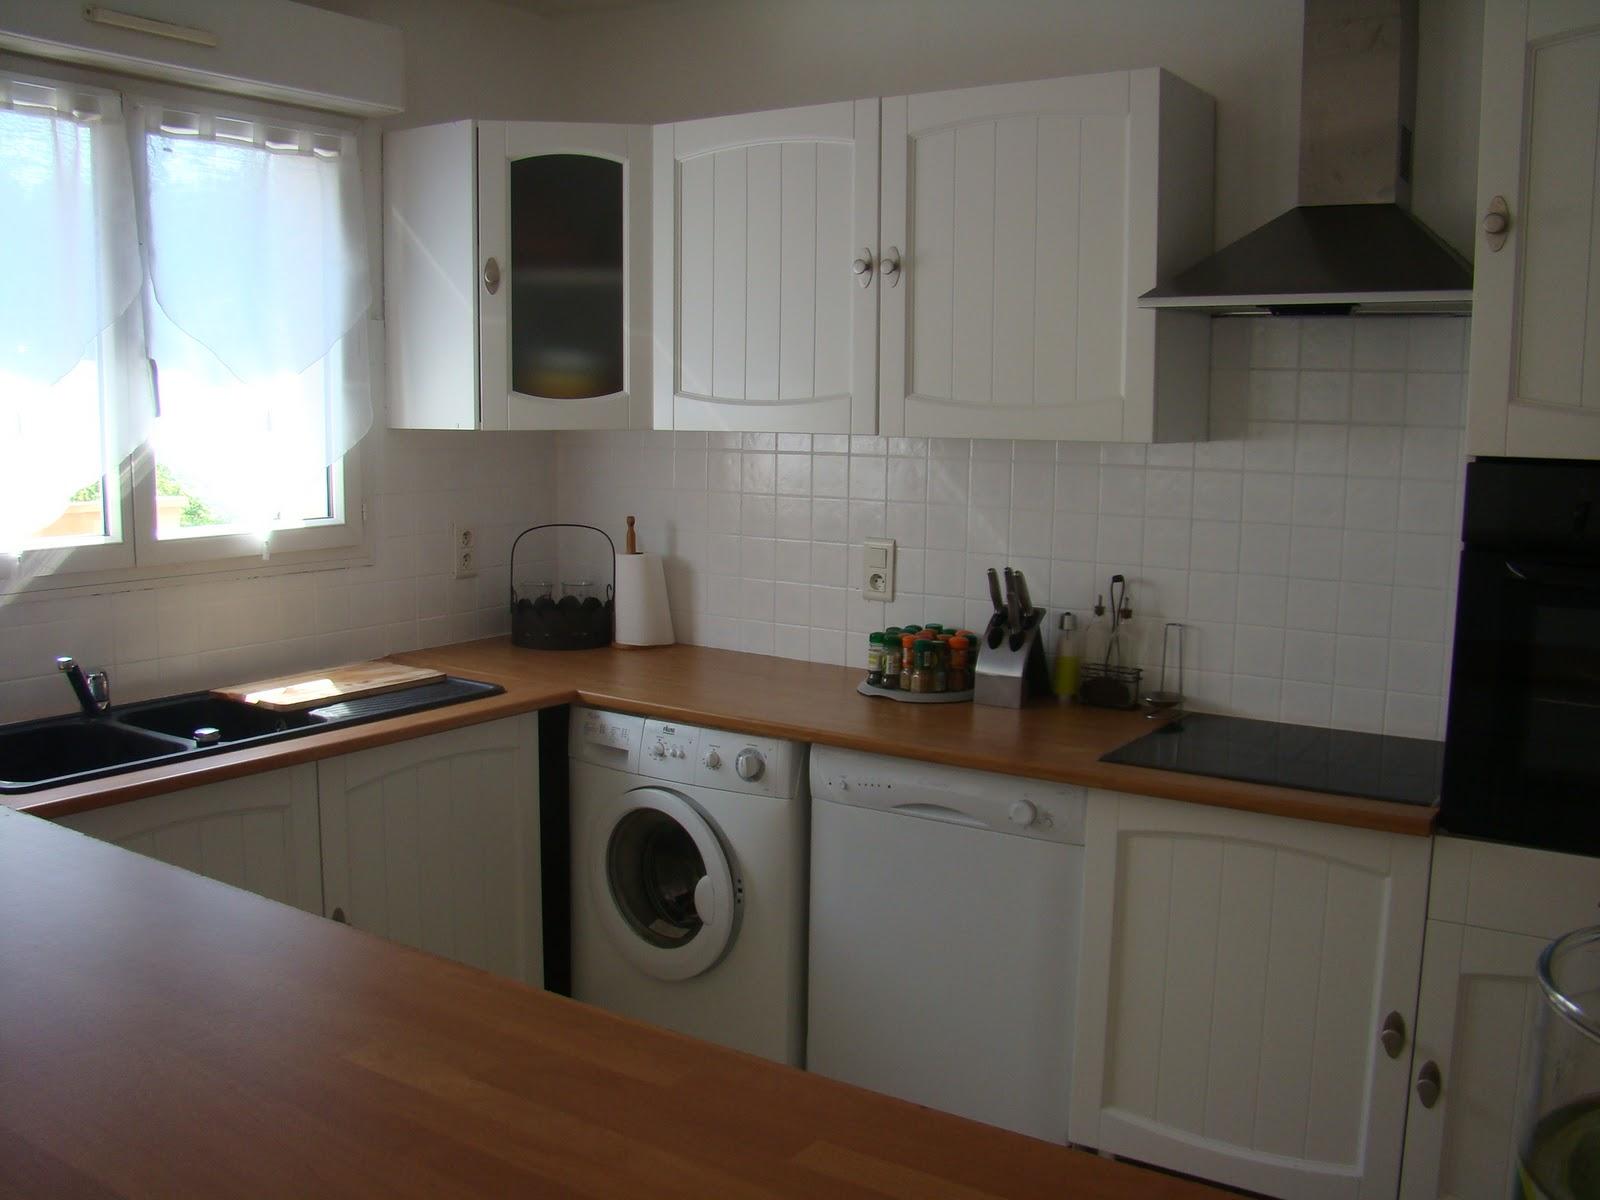 installation d 39 une cuisine am nag e. Black Bedroom Furniture Sets. Home Design Ideas